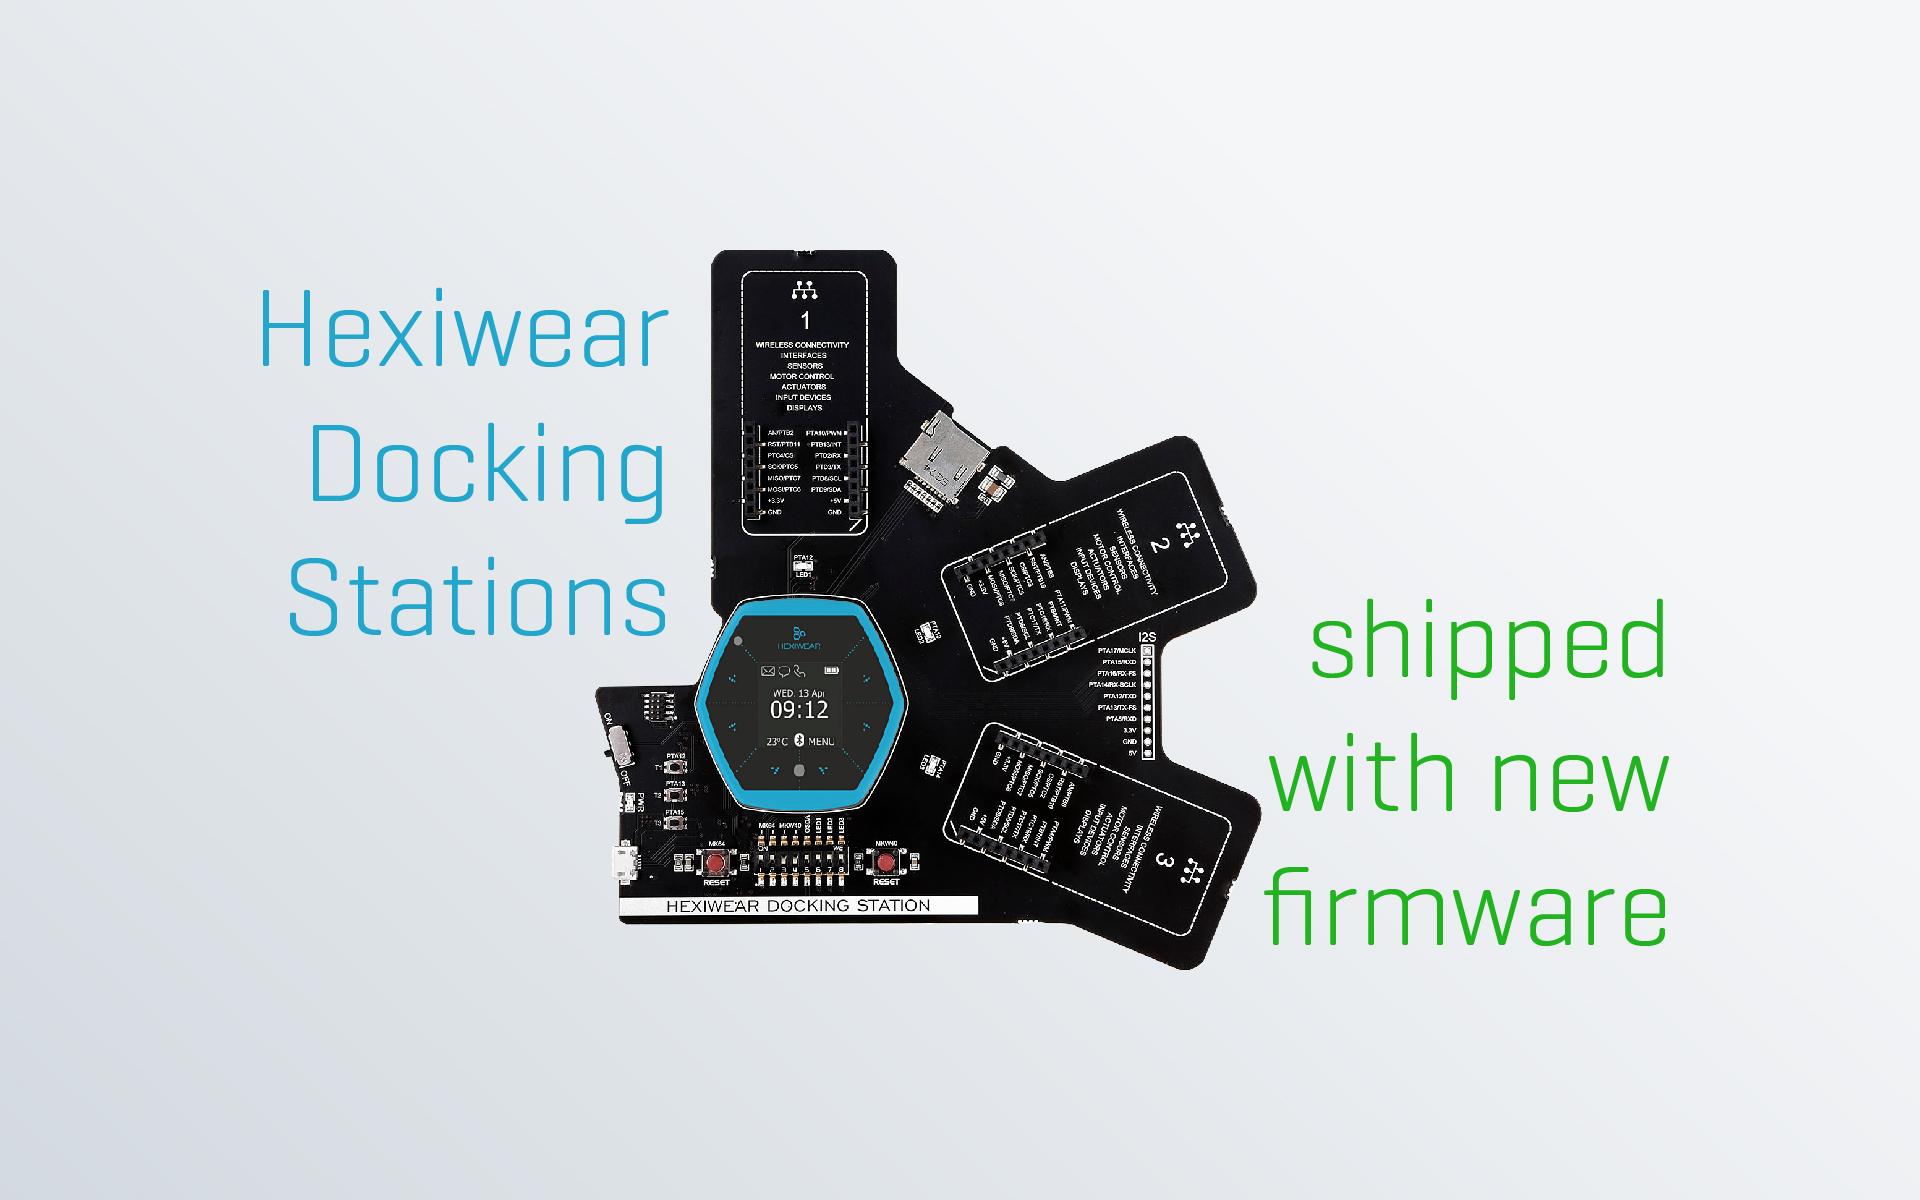 Hexiwear Docking station bootloader update